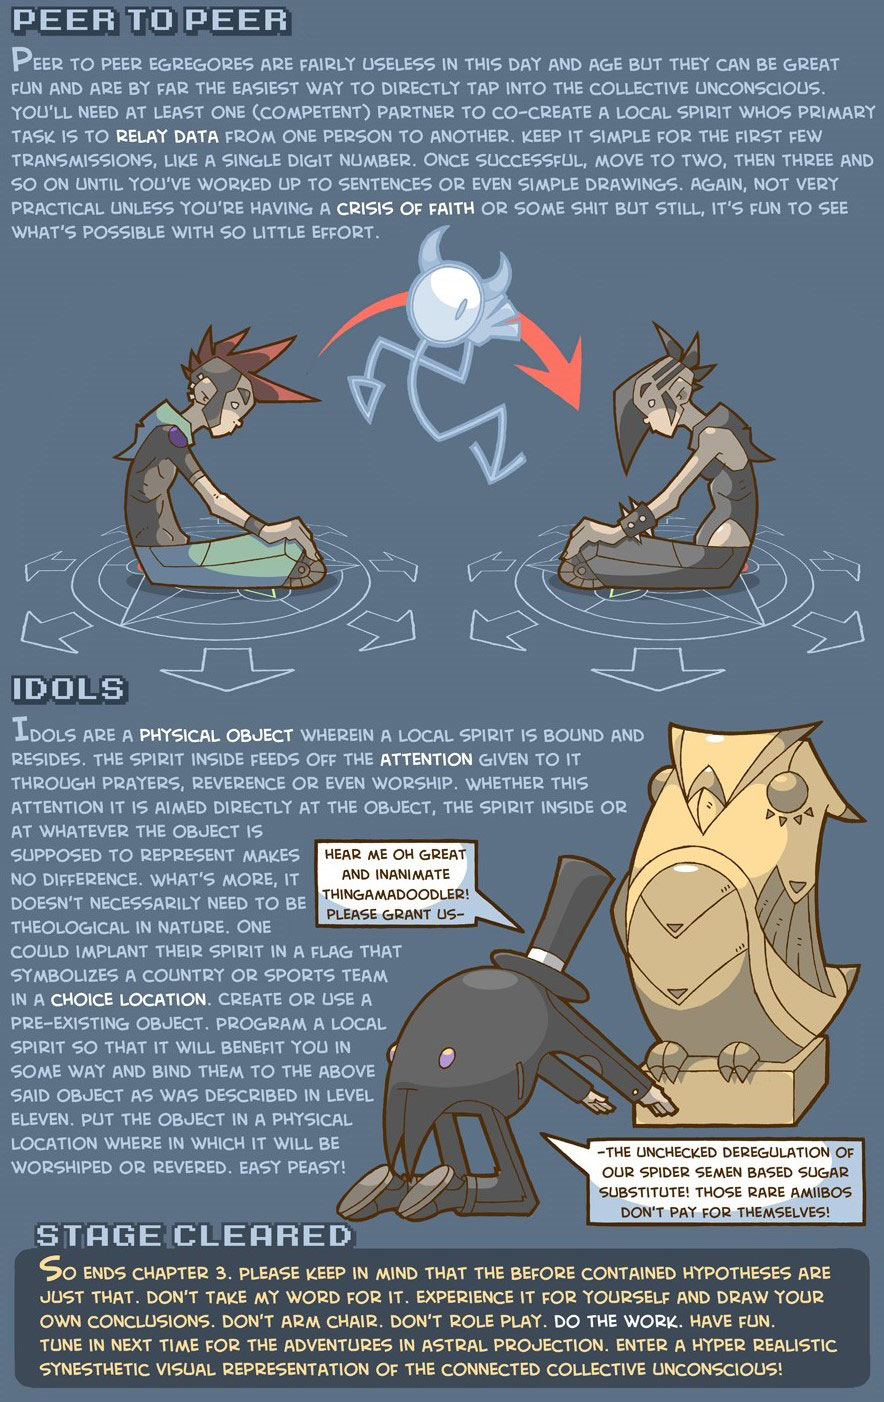 Psychonaut Field Manual by Archtraitor Bluefluke (Chaos Magick)